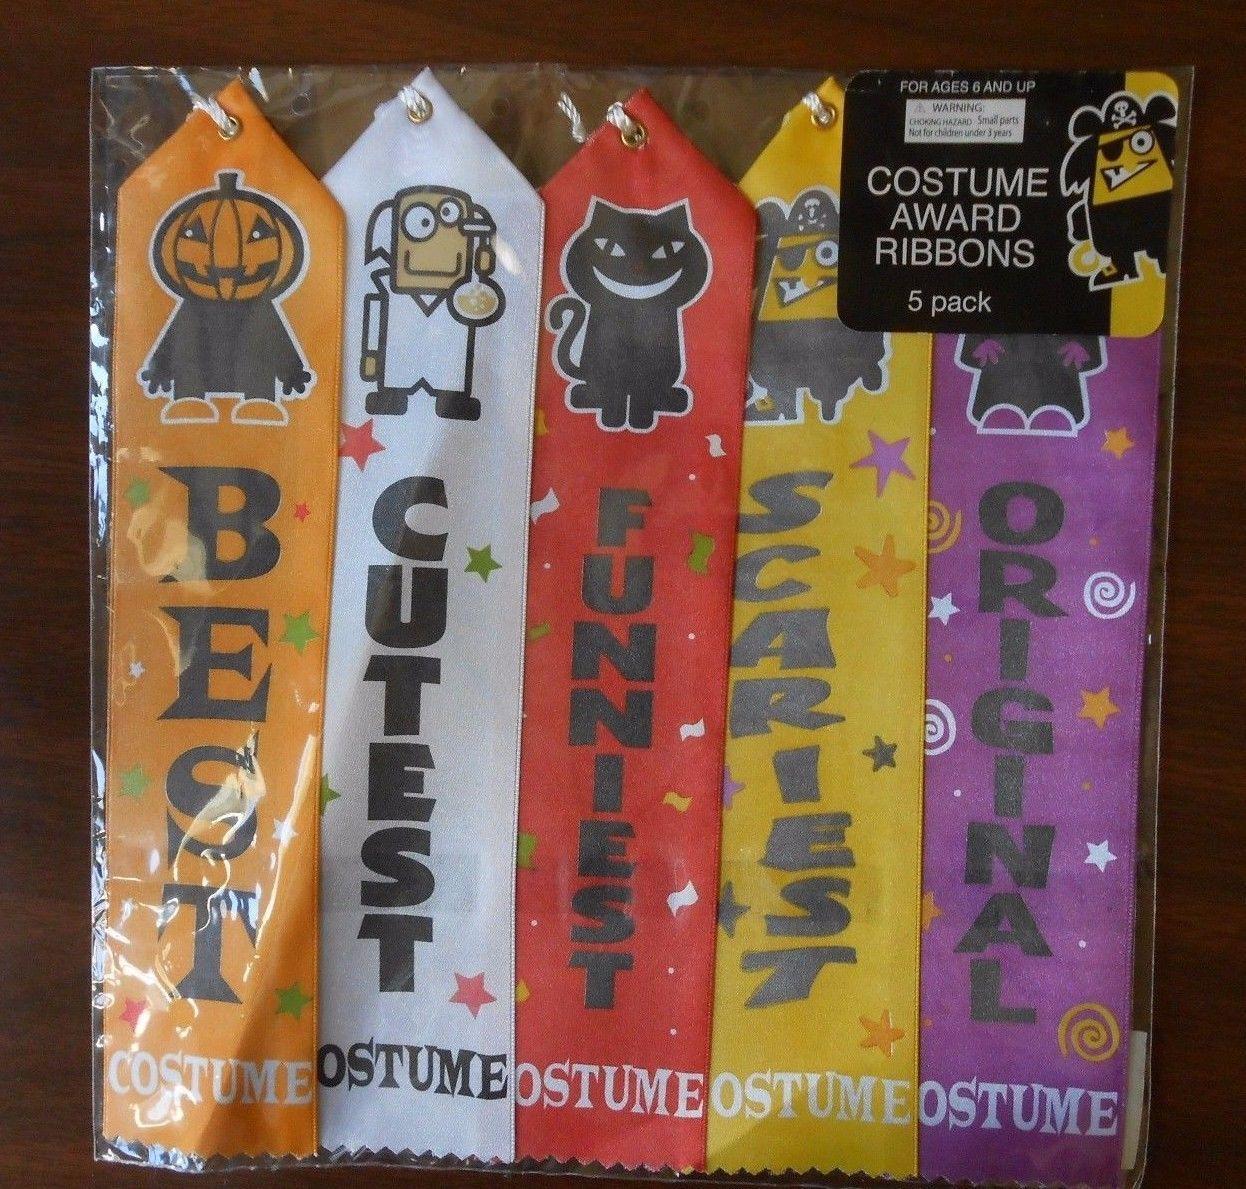 Halloween costume award ribbons set of best cutest funniest